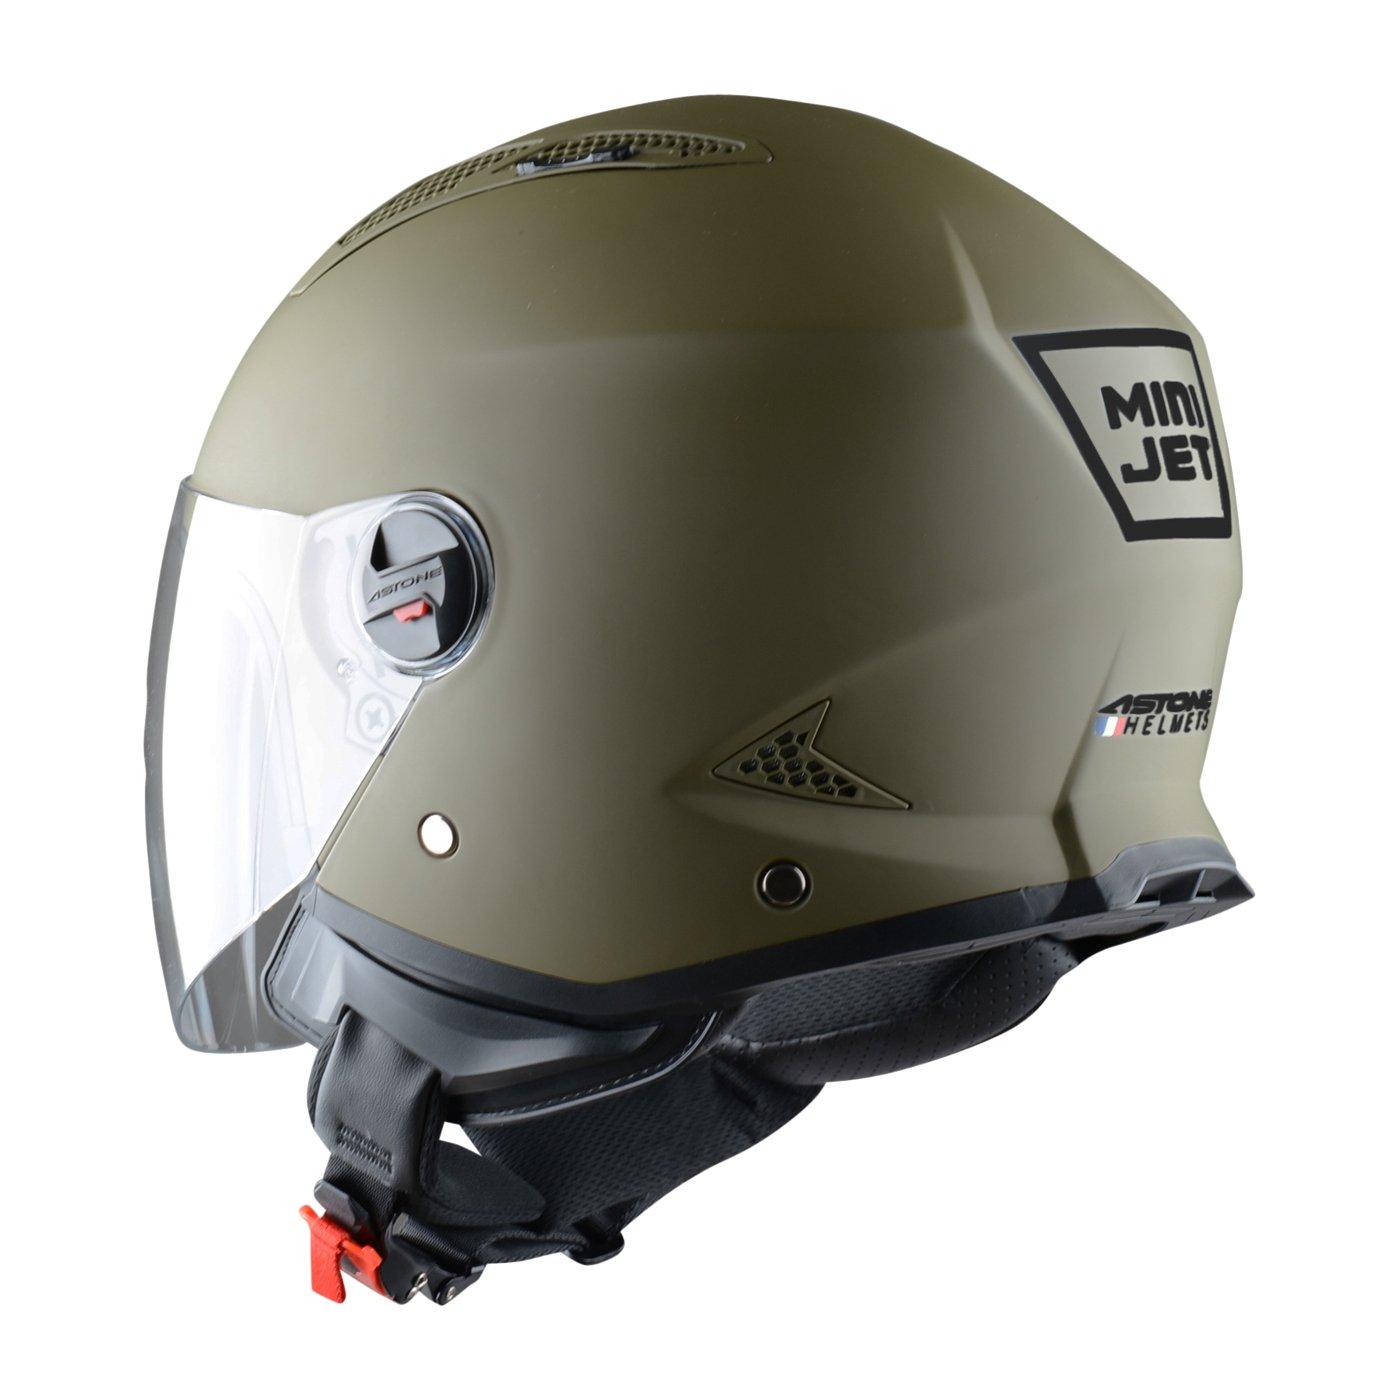 Amazon.es: Astone Helmets Mini Jet Army Casco Jet, color Verde (Matt Army), talla L